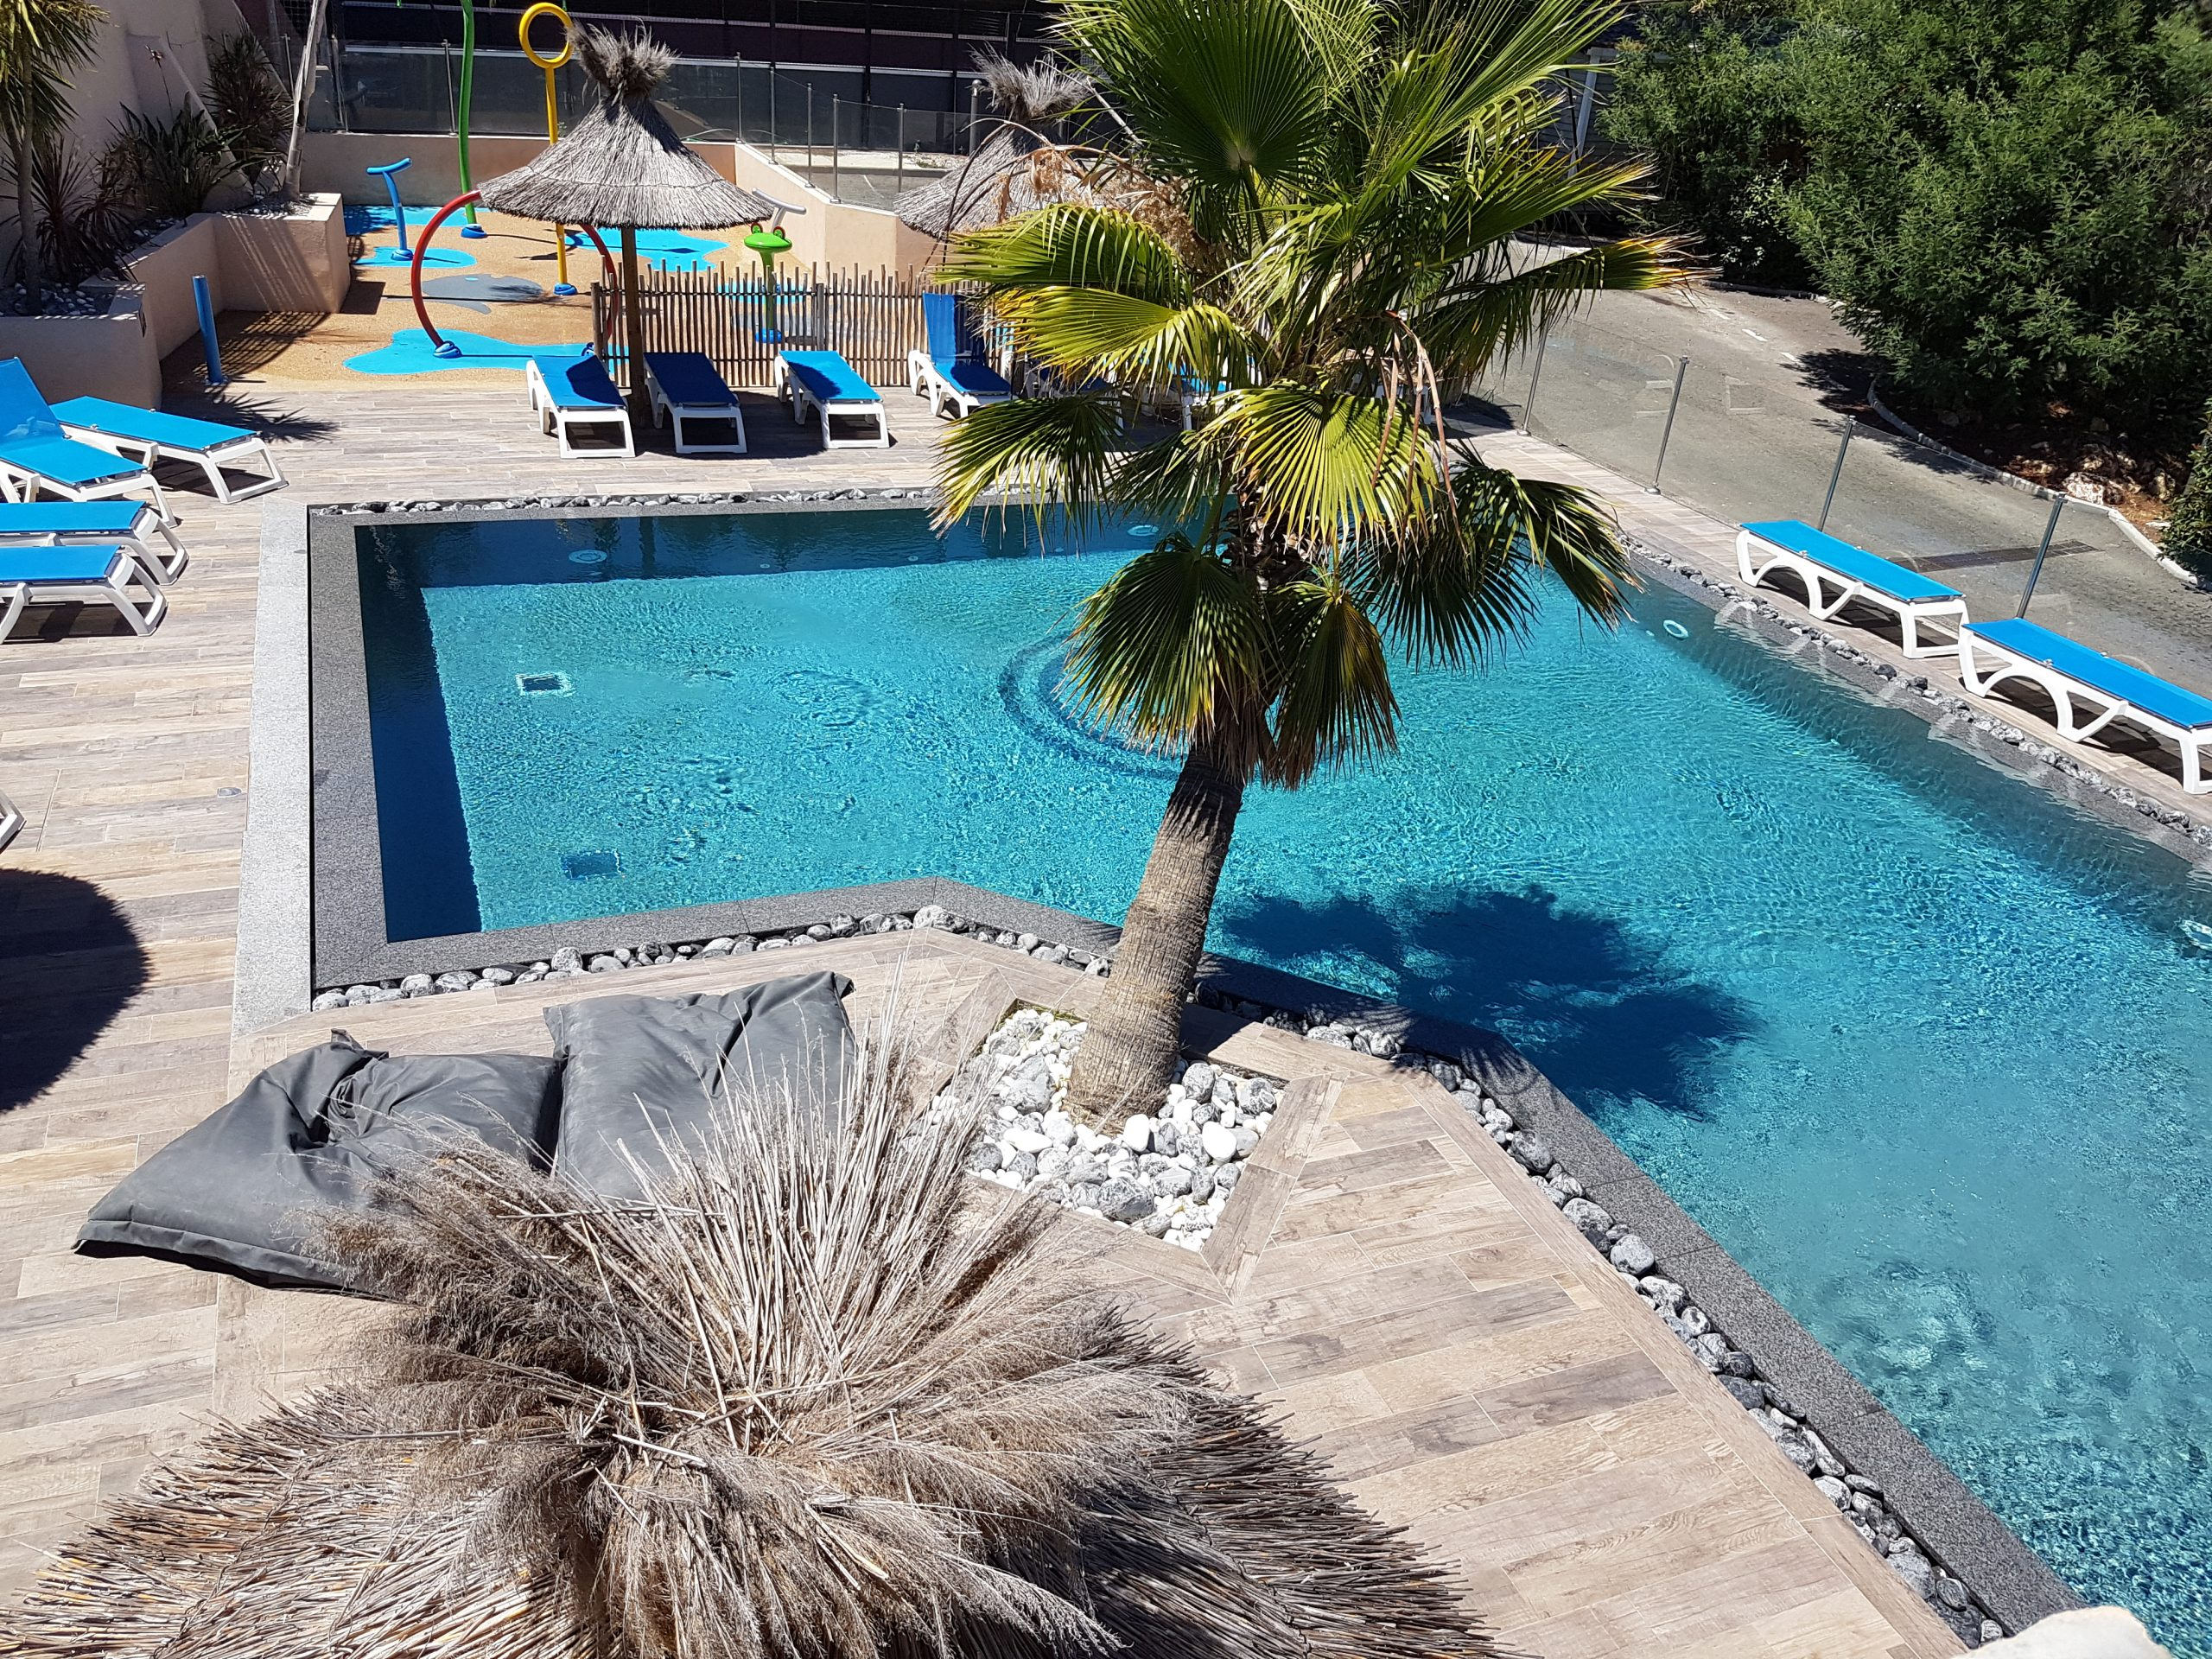 Campsite Ramatuelle With Pool   Cap Taillat   4-Star Var tout Camping Var Avec Piscine